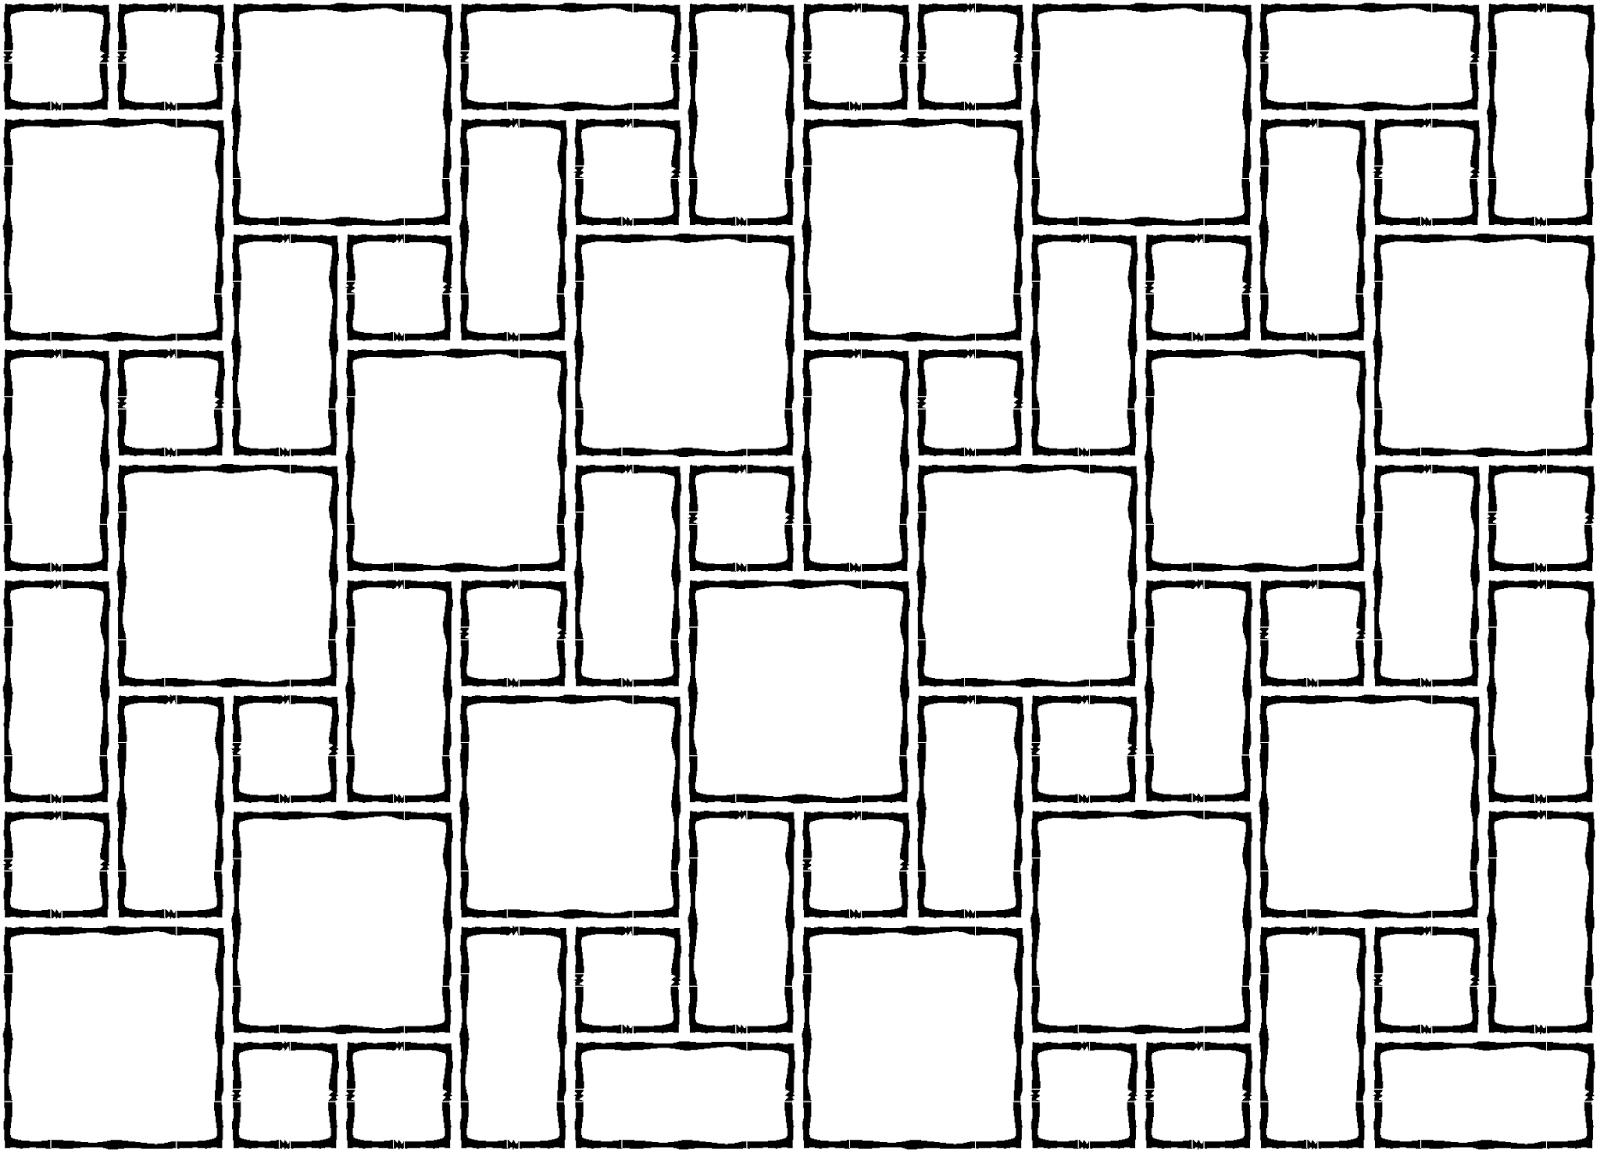 Marvelous Tudor Patio Slab Laying Pattern